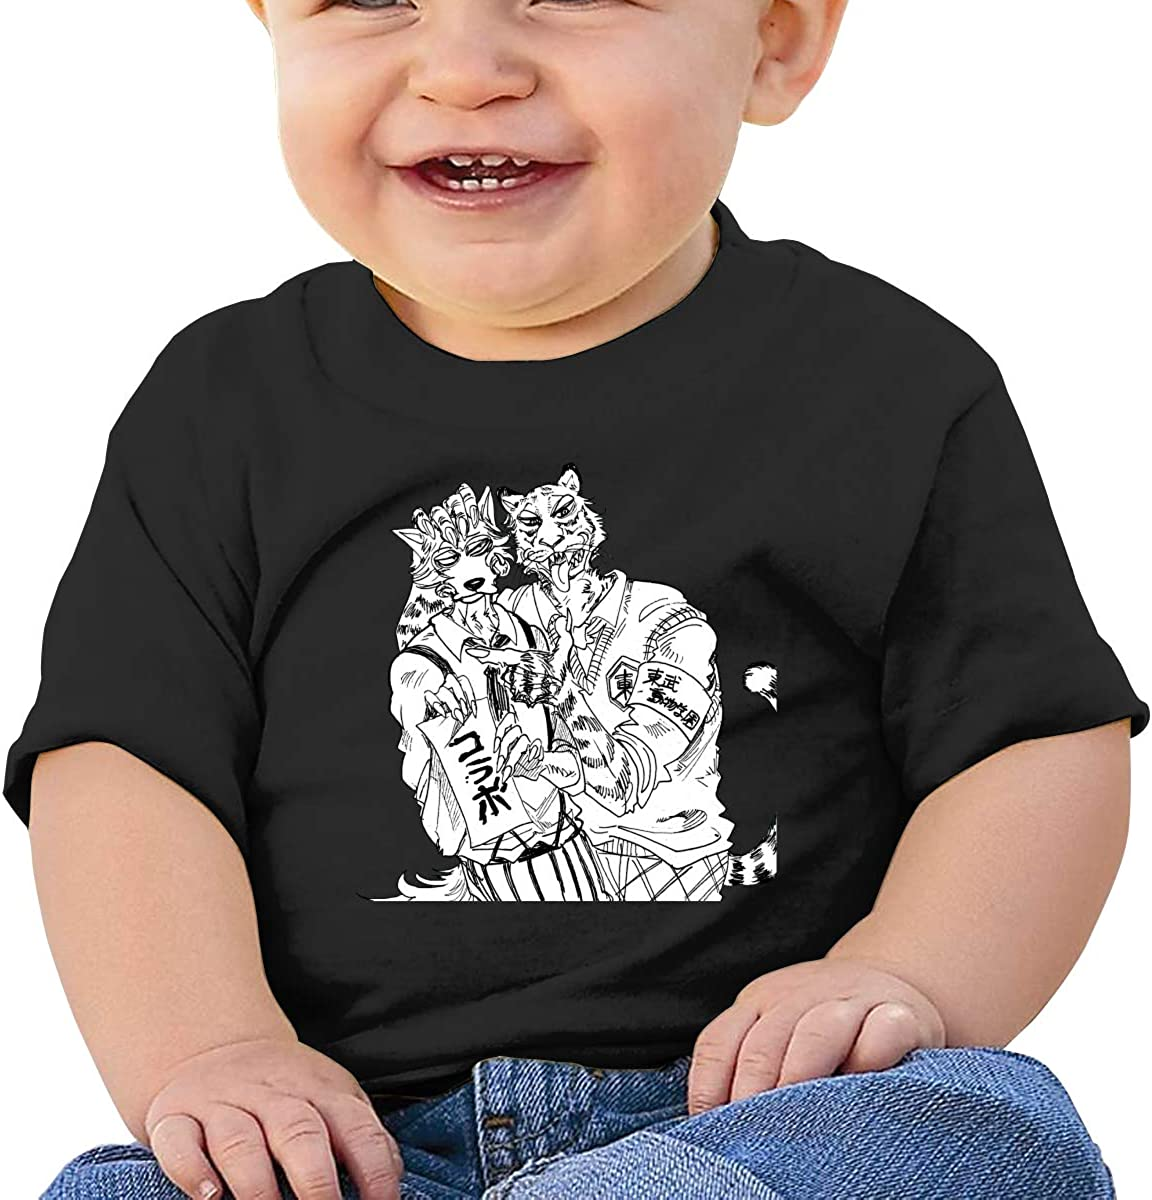 LIIREN Beastars Tee Custom Cute T-Shirt for Baby Black